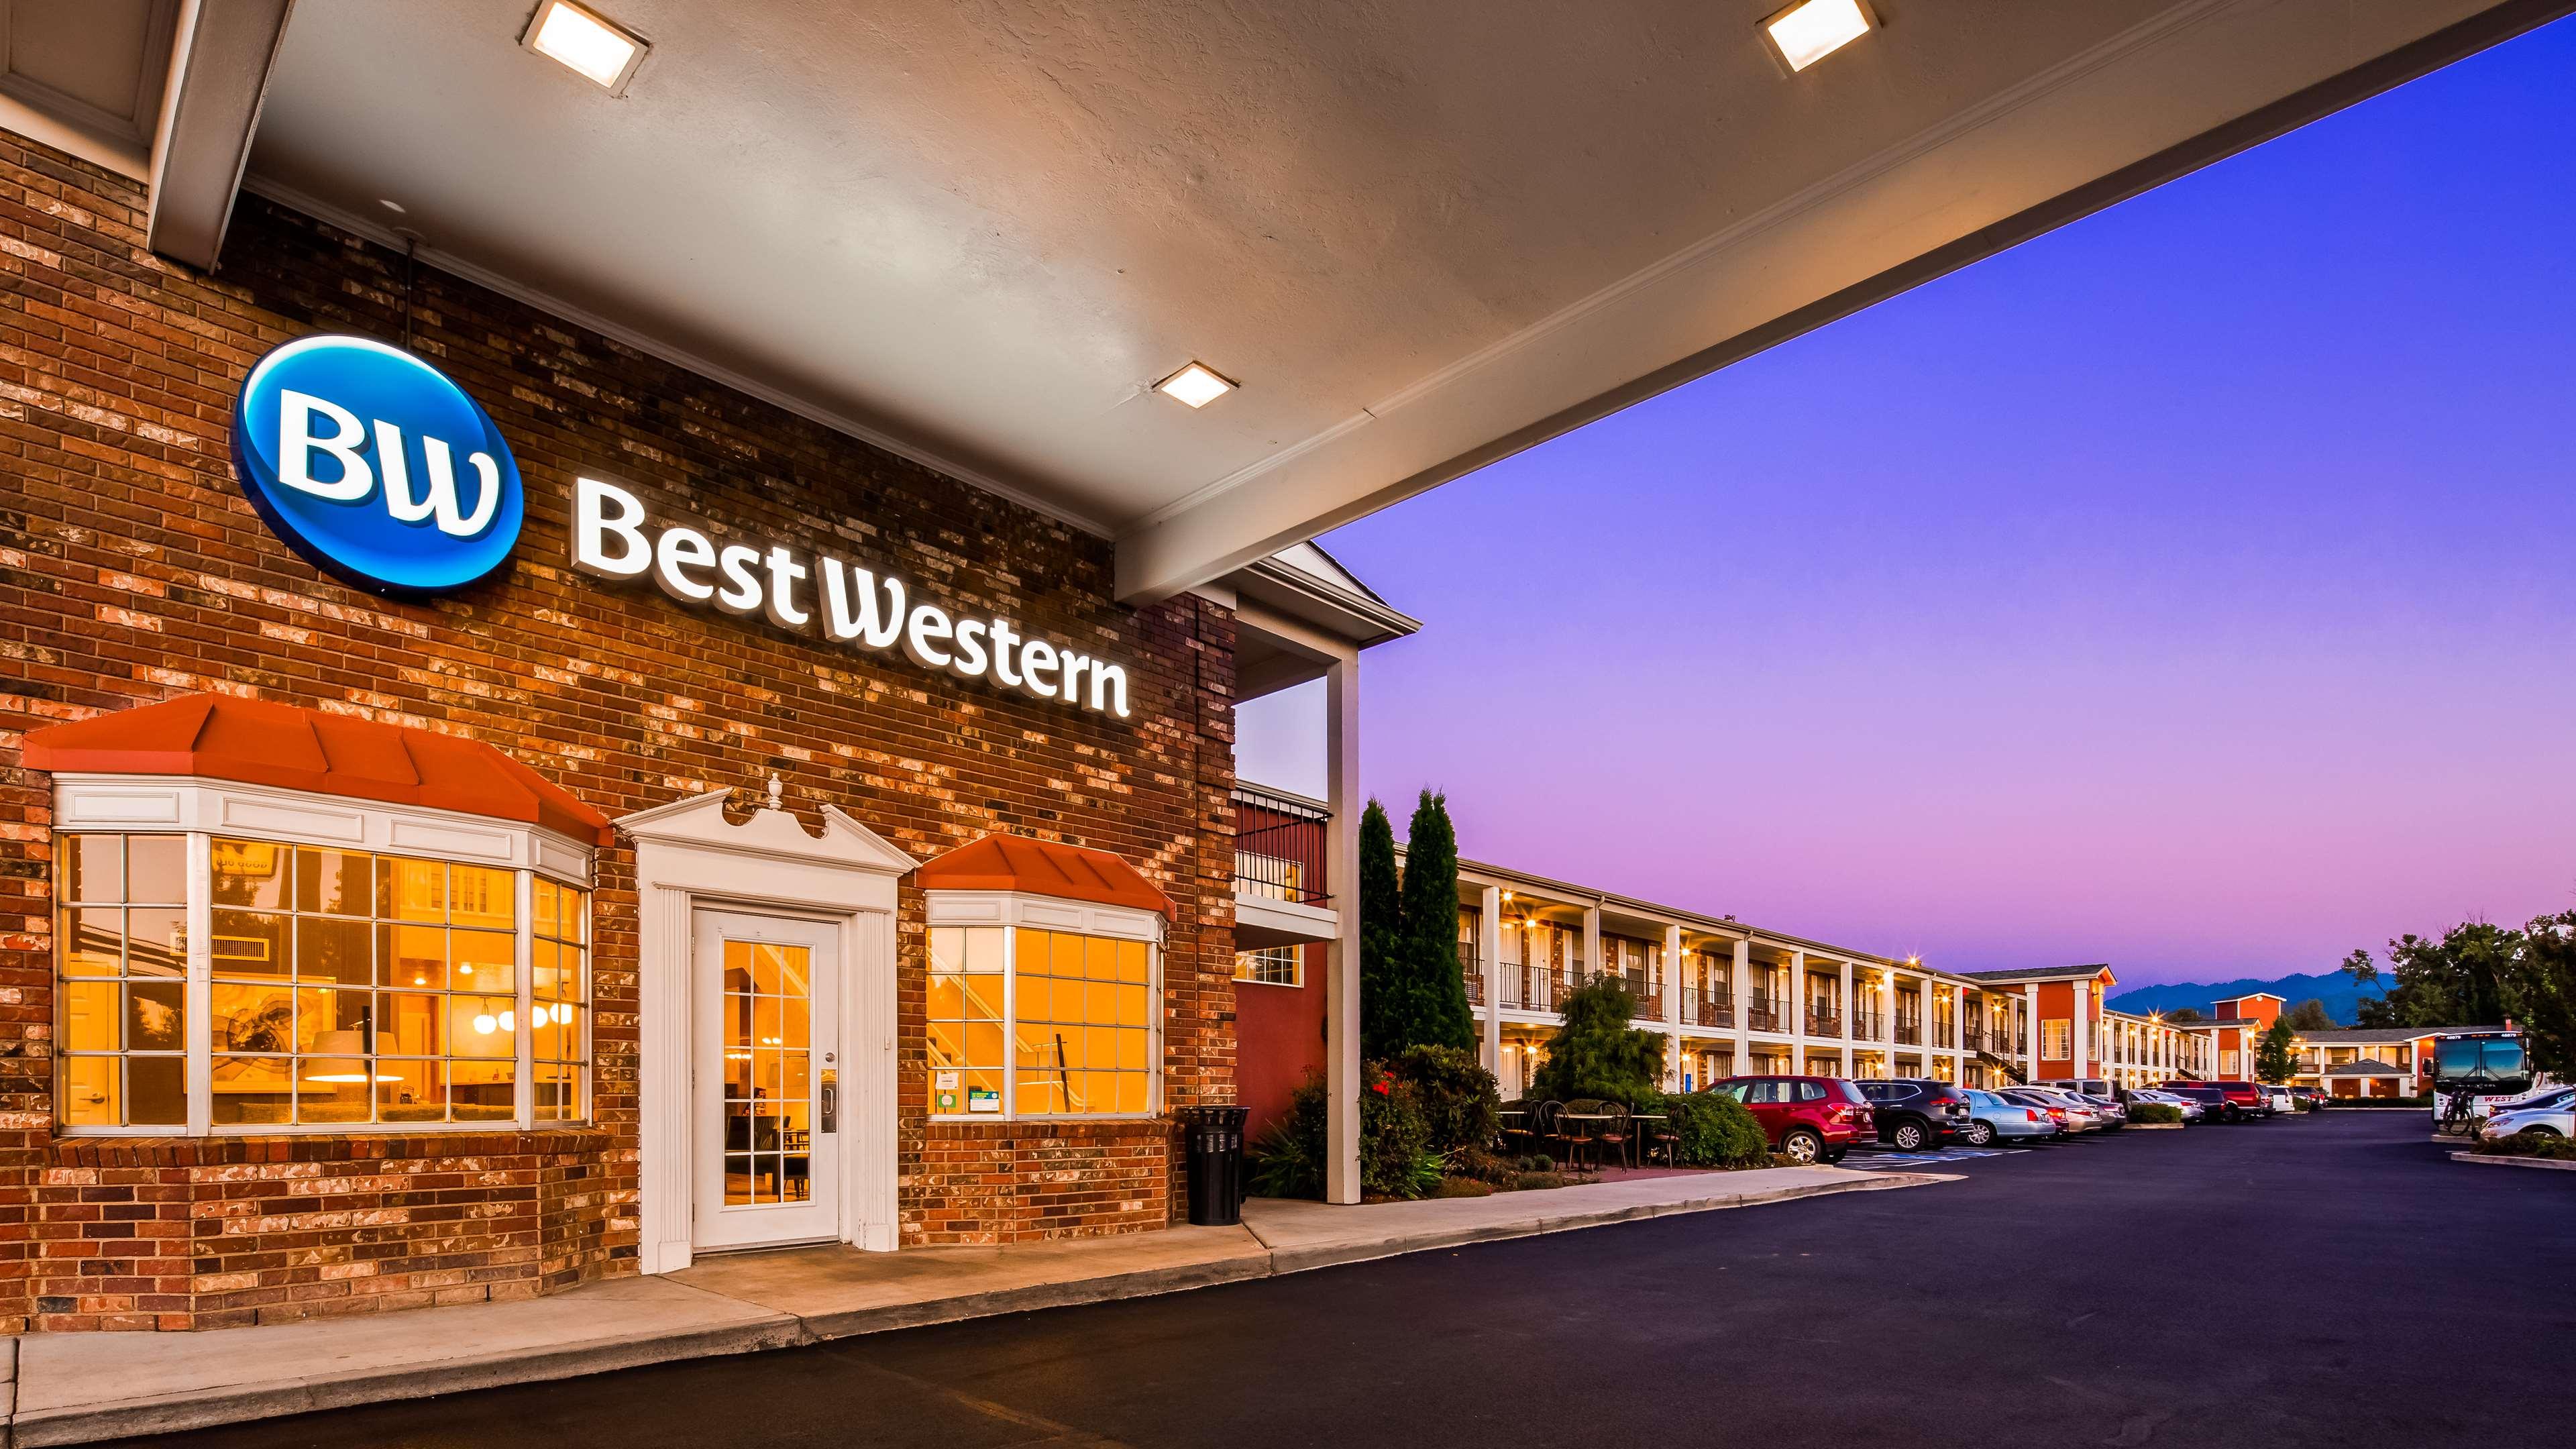 Best Western Horizon Inn image 2